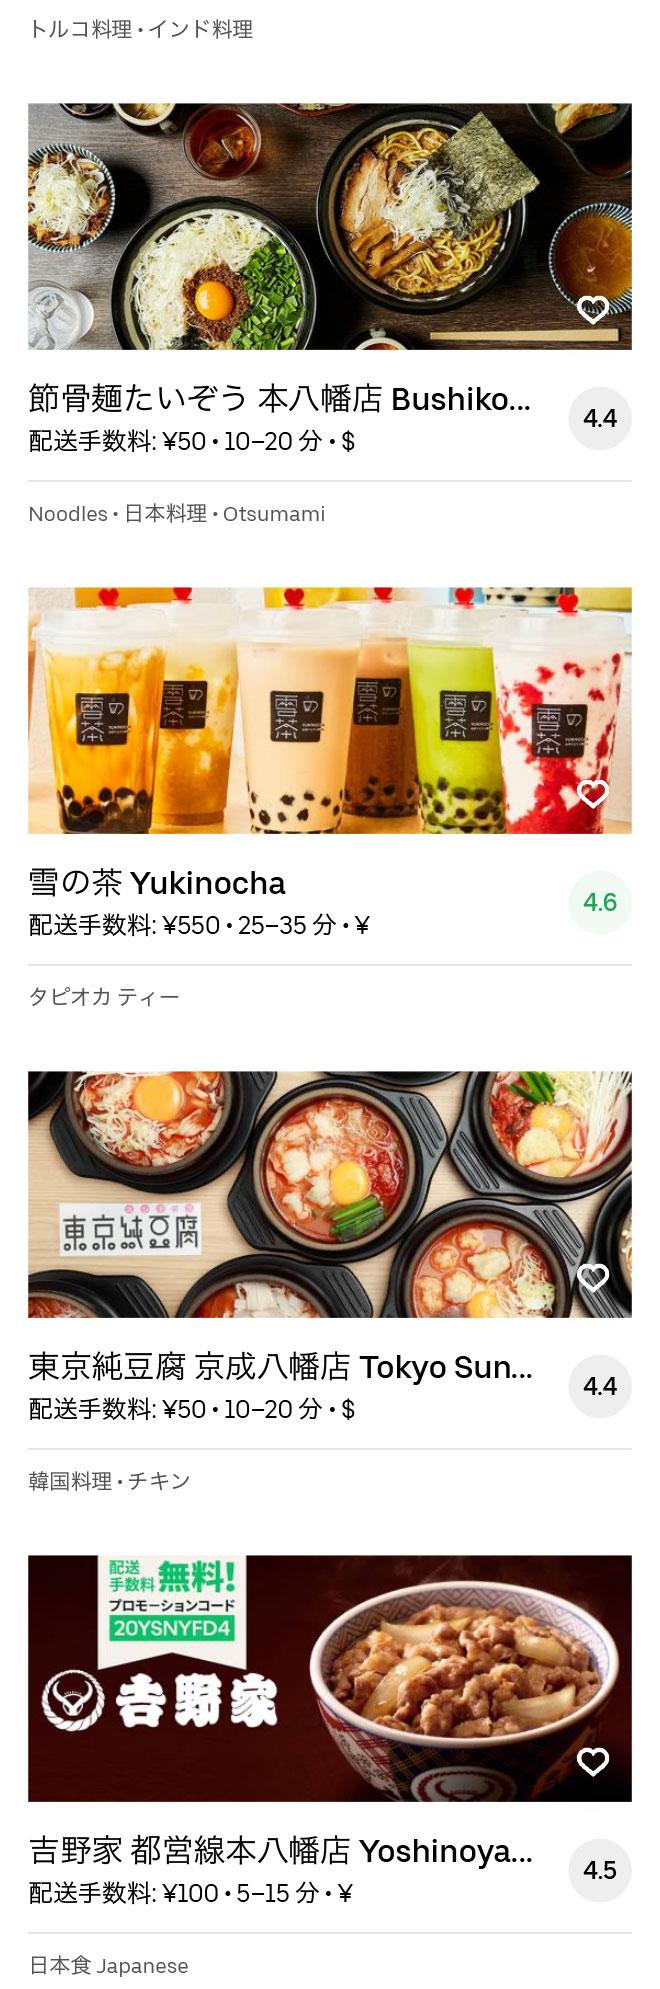 Ichikawa motoyawata menu 2004 06